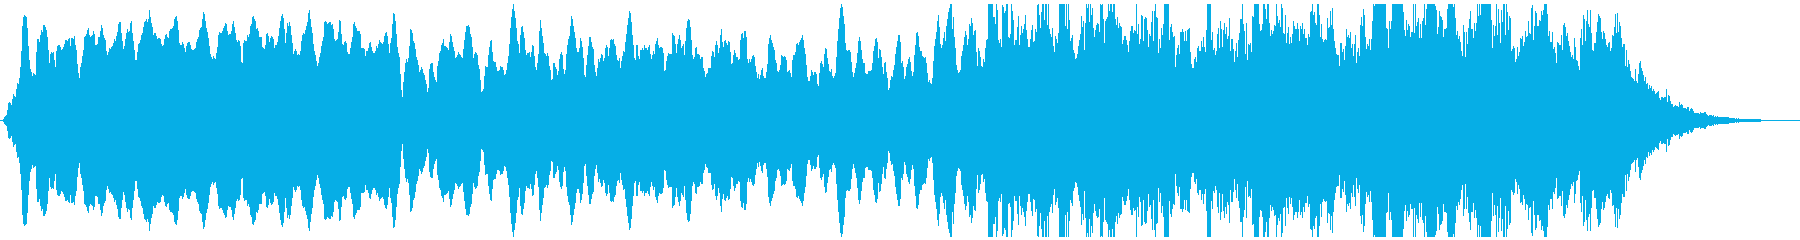 PADS 不安定な05の再生済みの波形